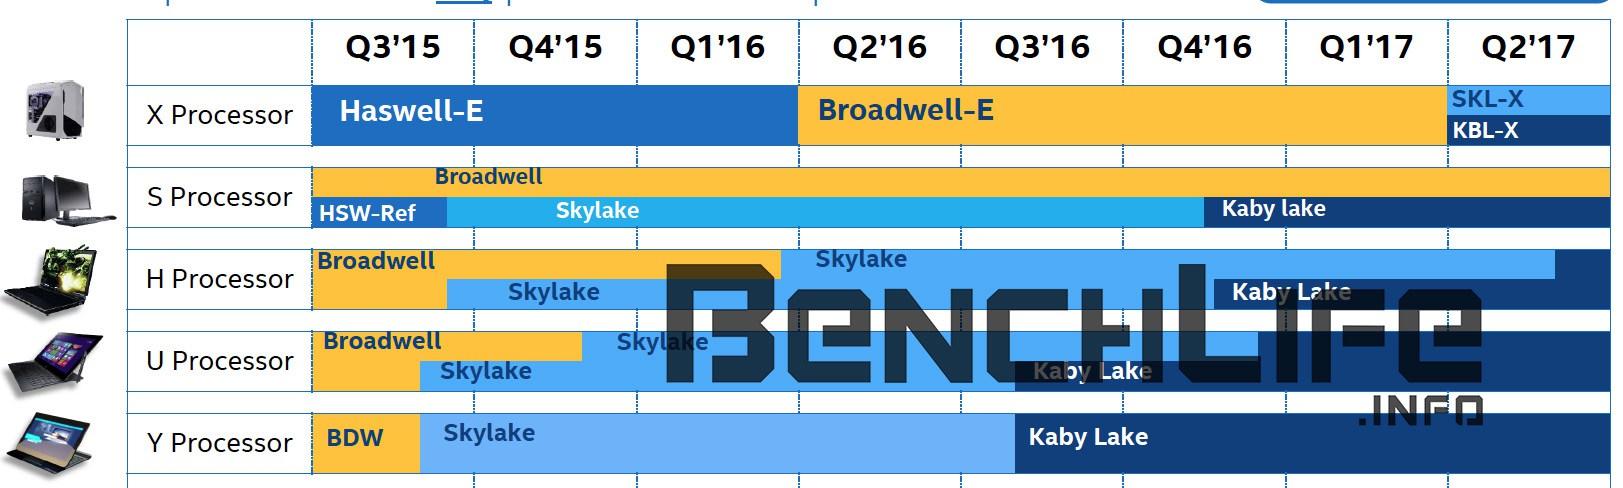 Intel-Skylake-X-and-Kaby-Lake-X-Leaked-Roadmap